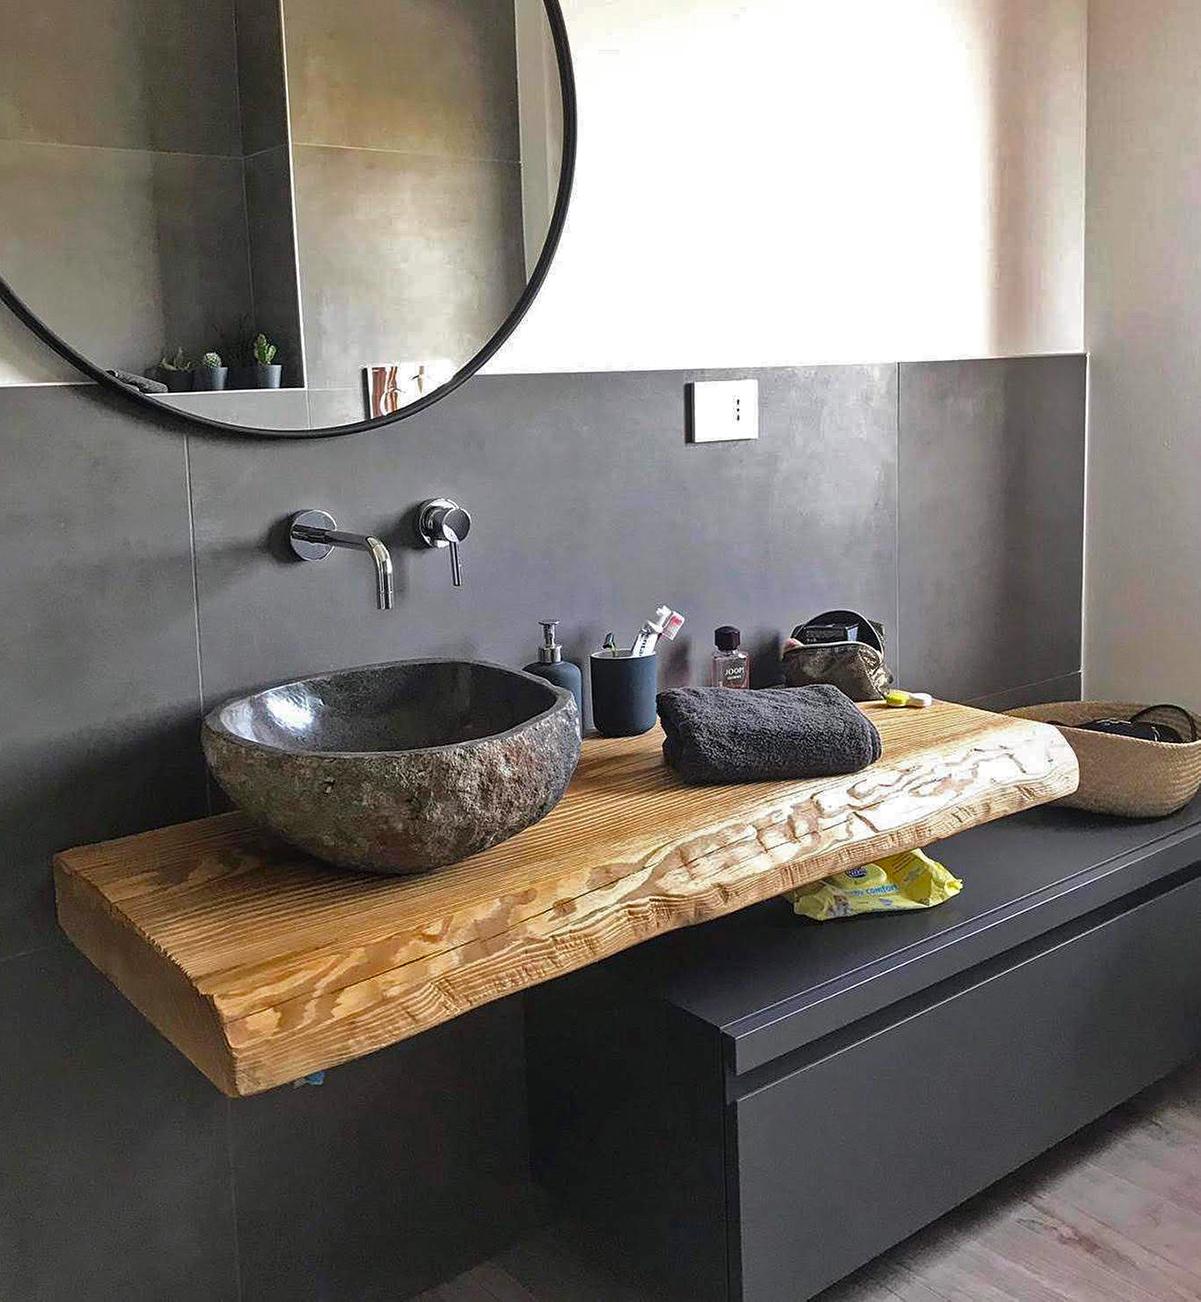 Mobile bagno sospeso 120 cm mensola legno per lavabo e for Mobile sospeso bagno